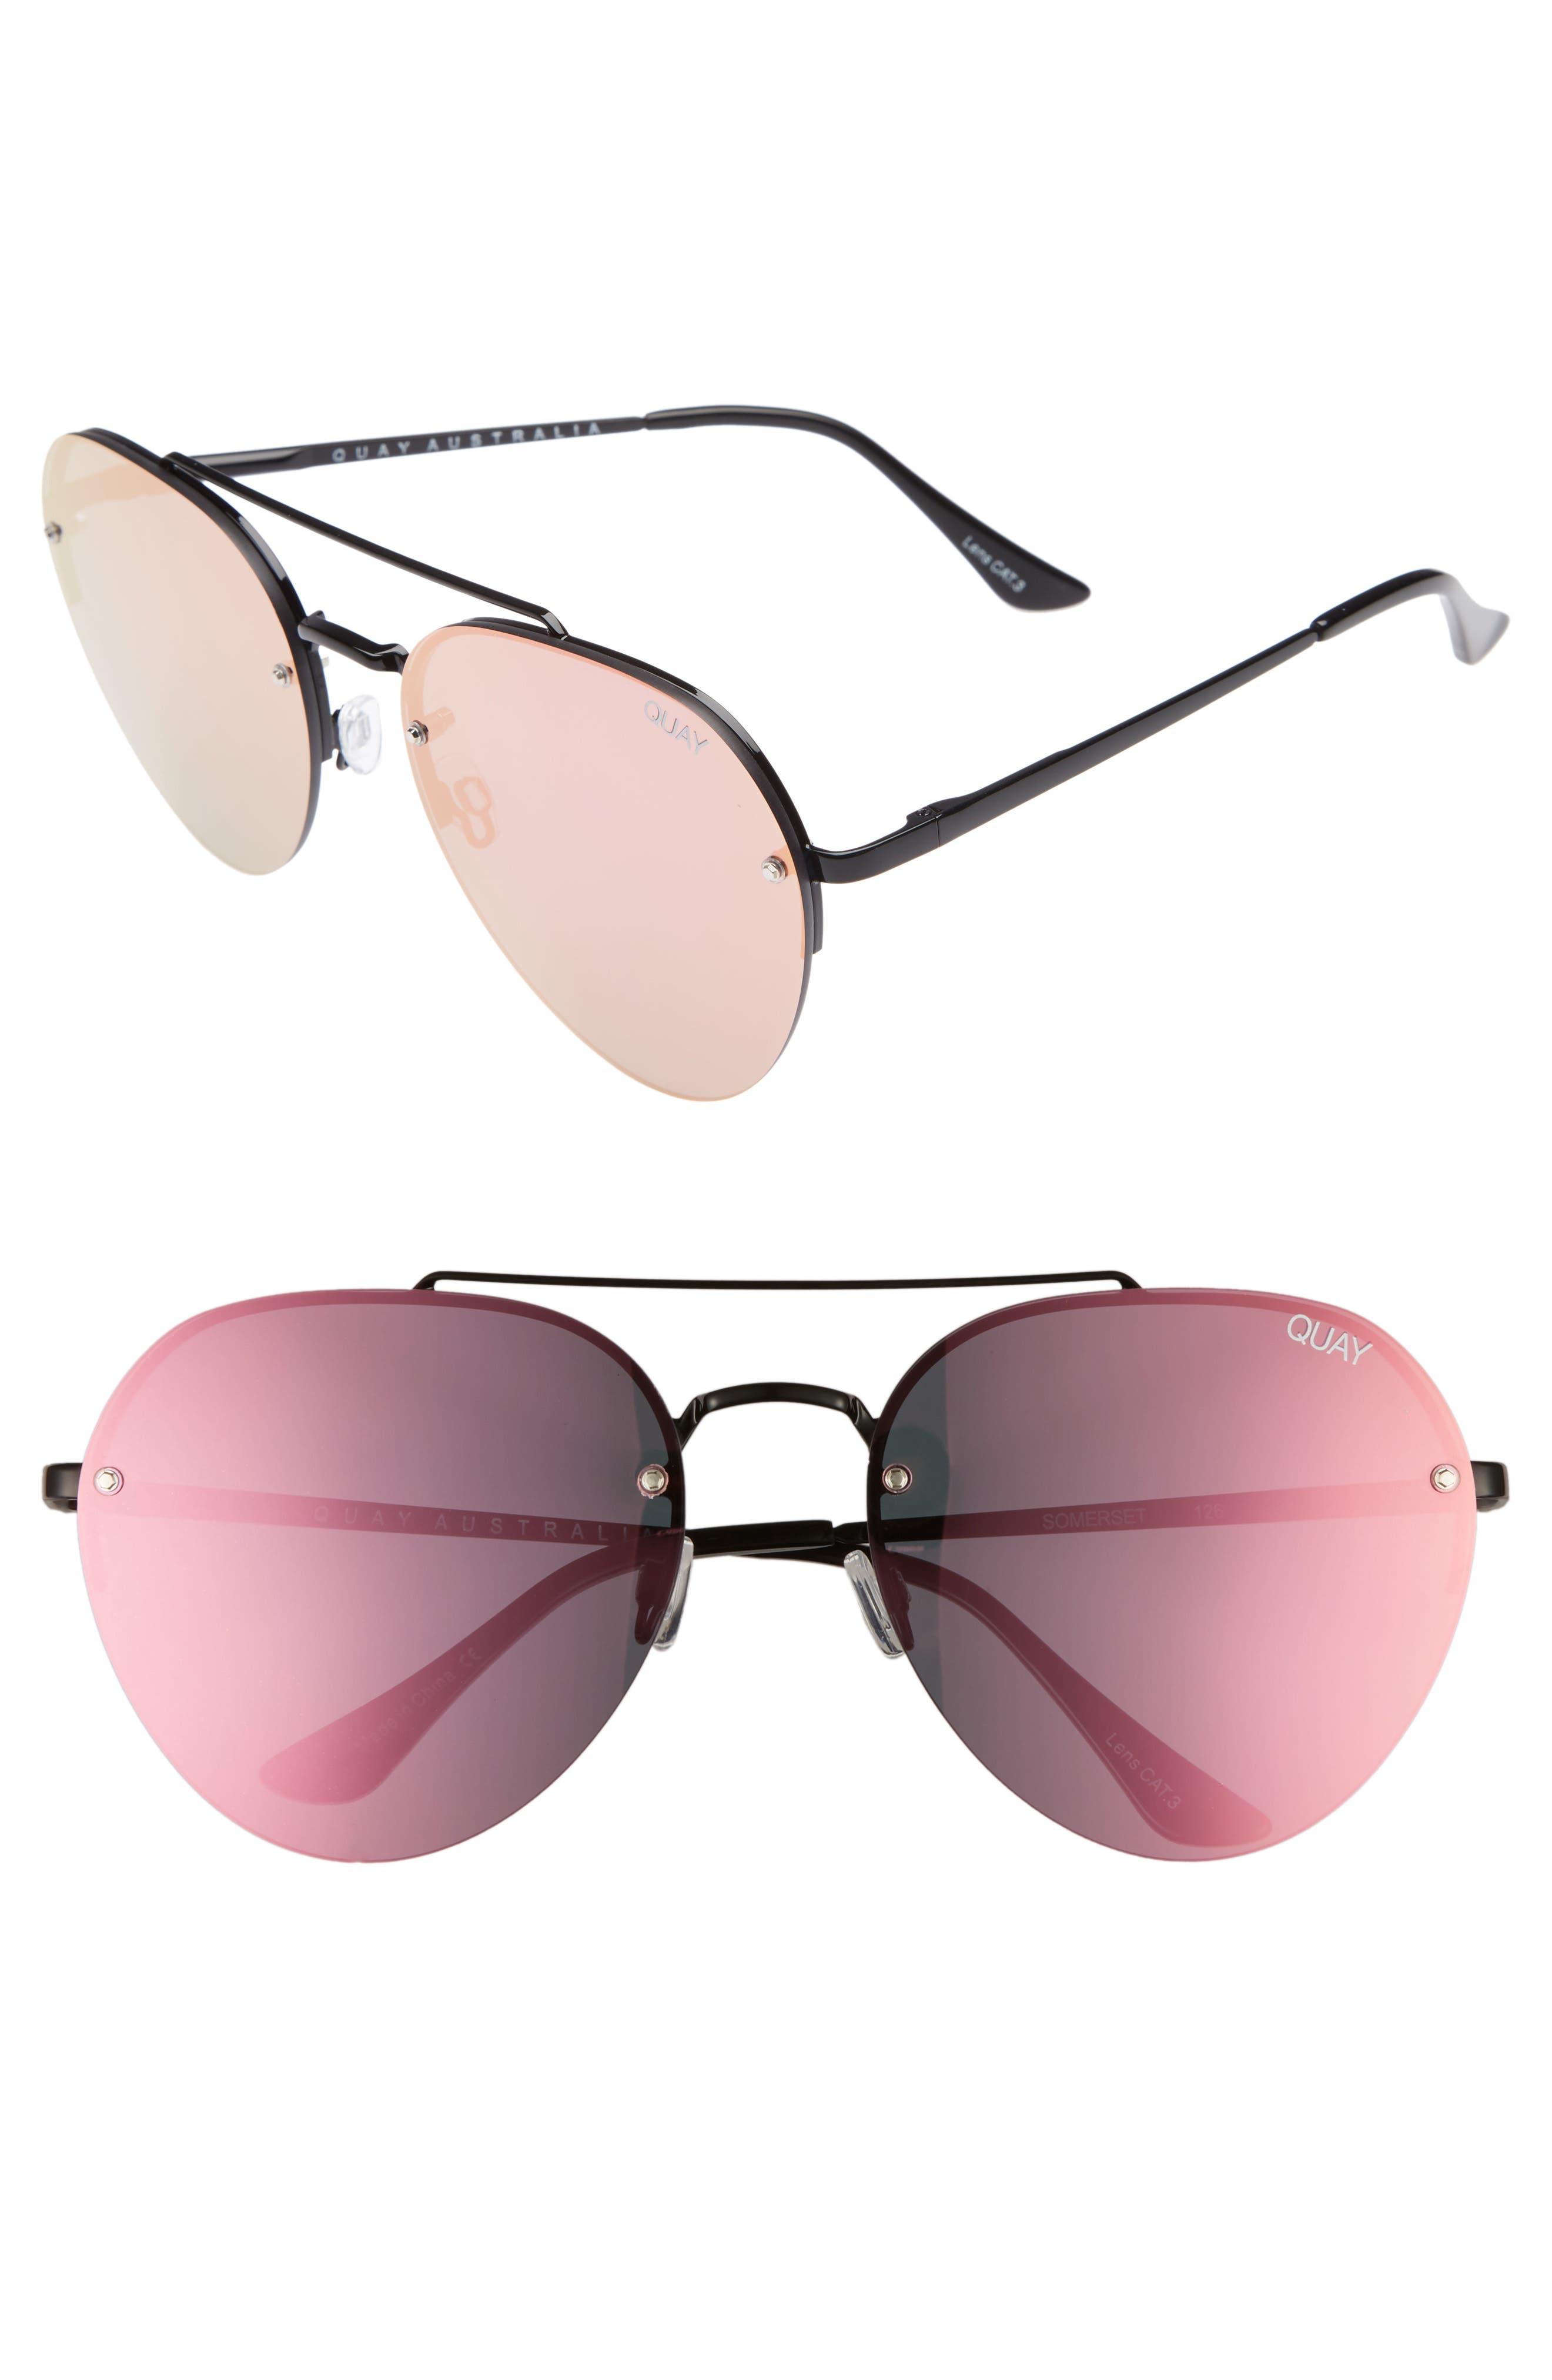 Somerset 65mm Aviator Sunglasses,                             Main thumbnail 1, color,                             Black/ Pink